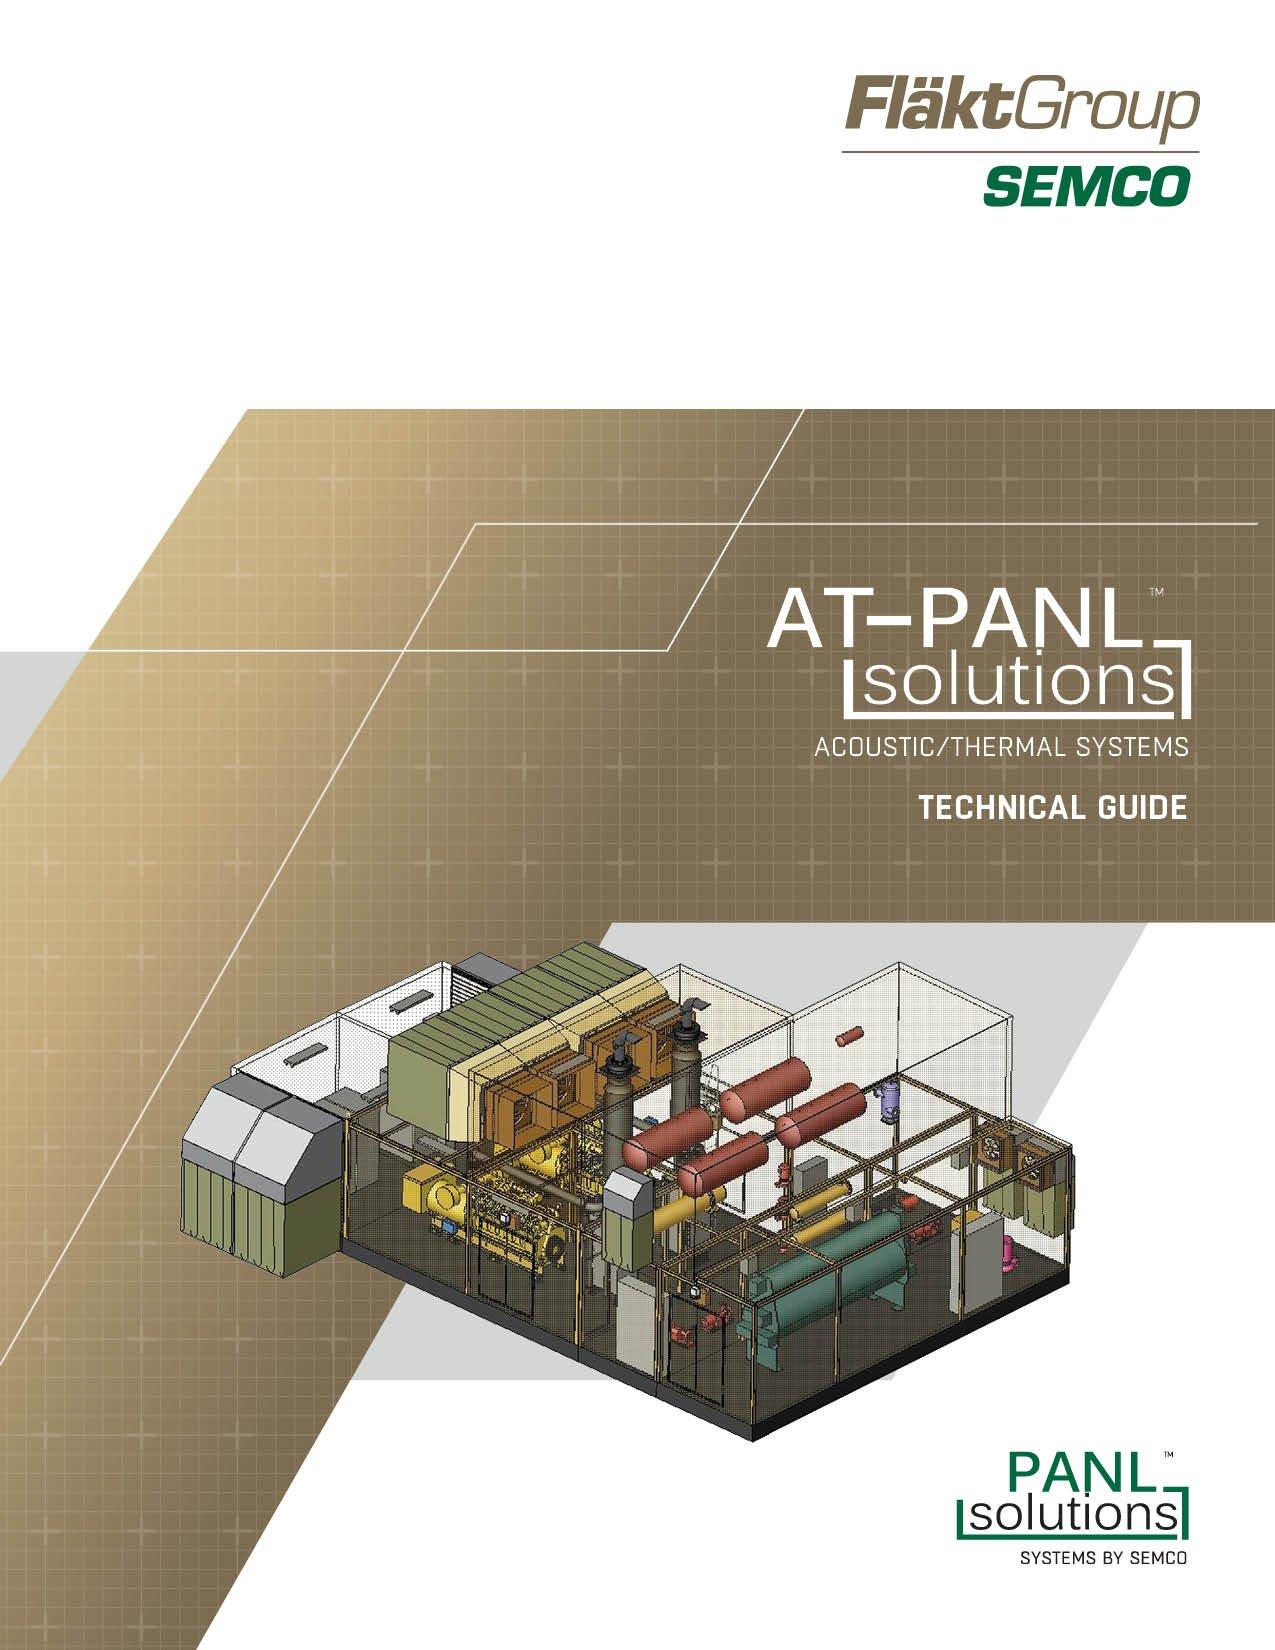 Acoustic Thermal Panel Technical Guide - FlaktGroup Semco 2018-02.jpg